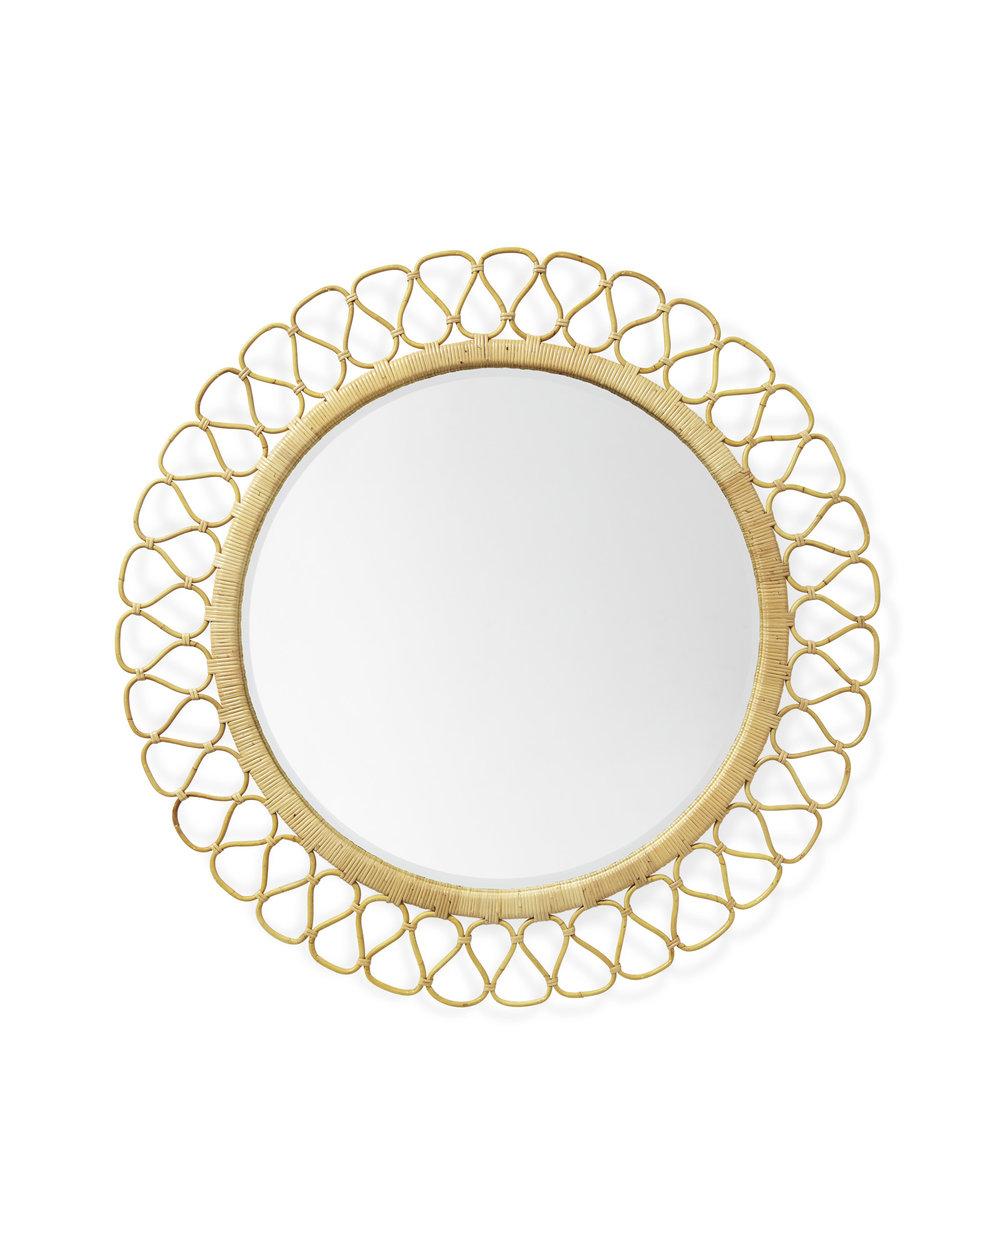 Mirror_Topeka_Large_Natural_MV_0203_Crop_SH.jpg